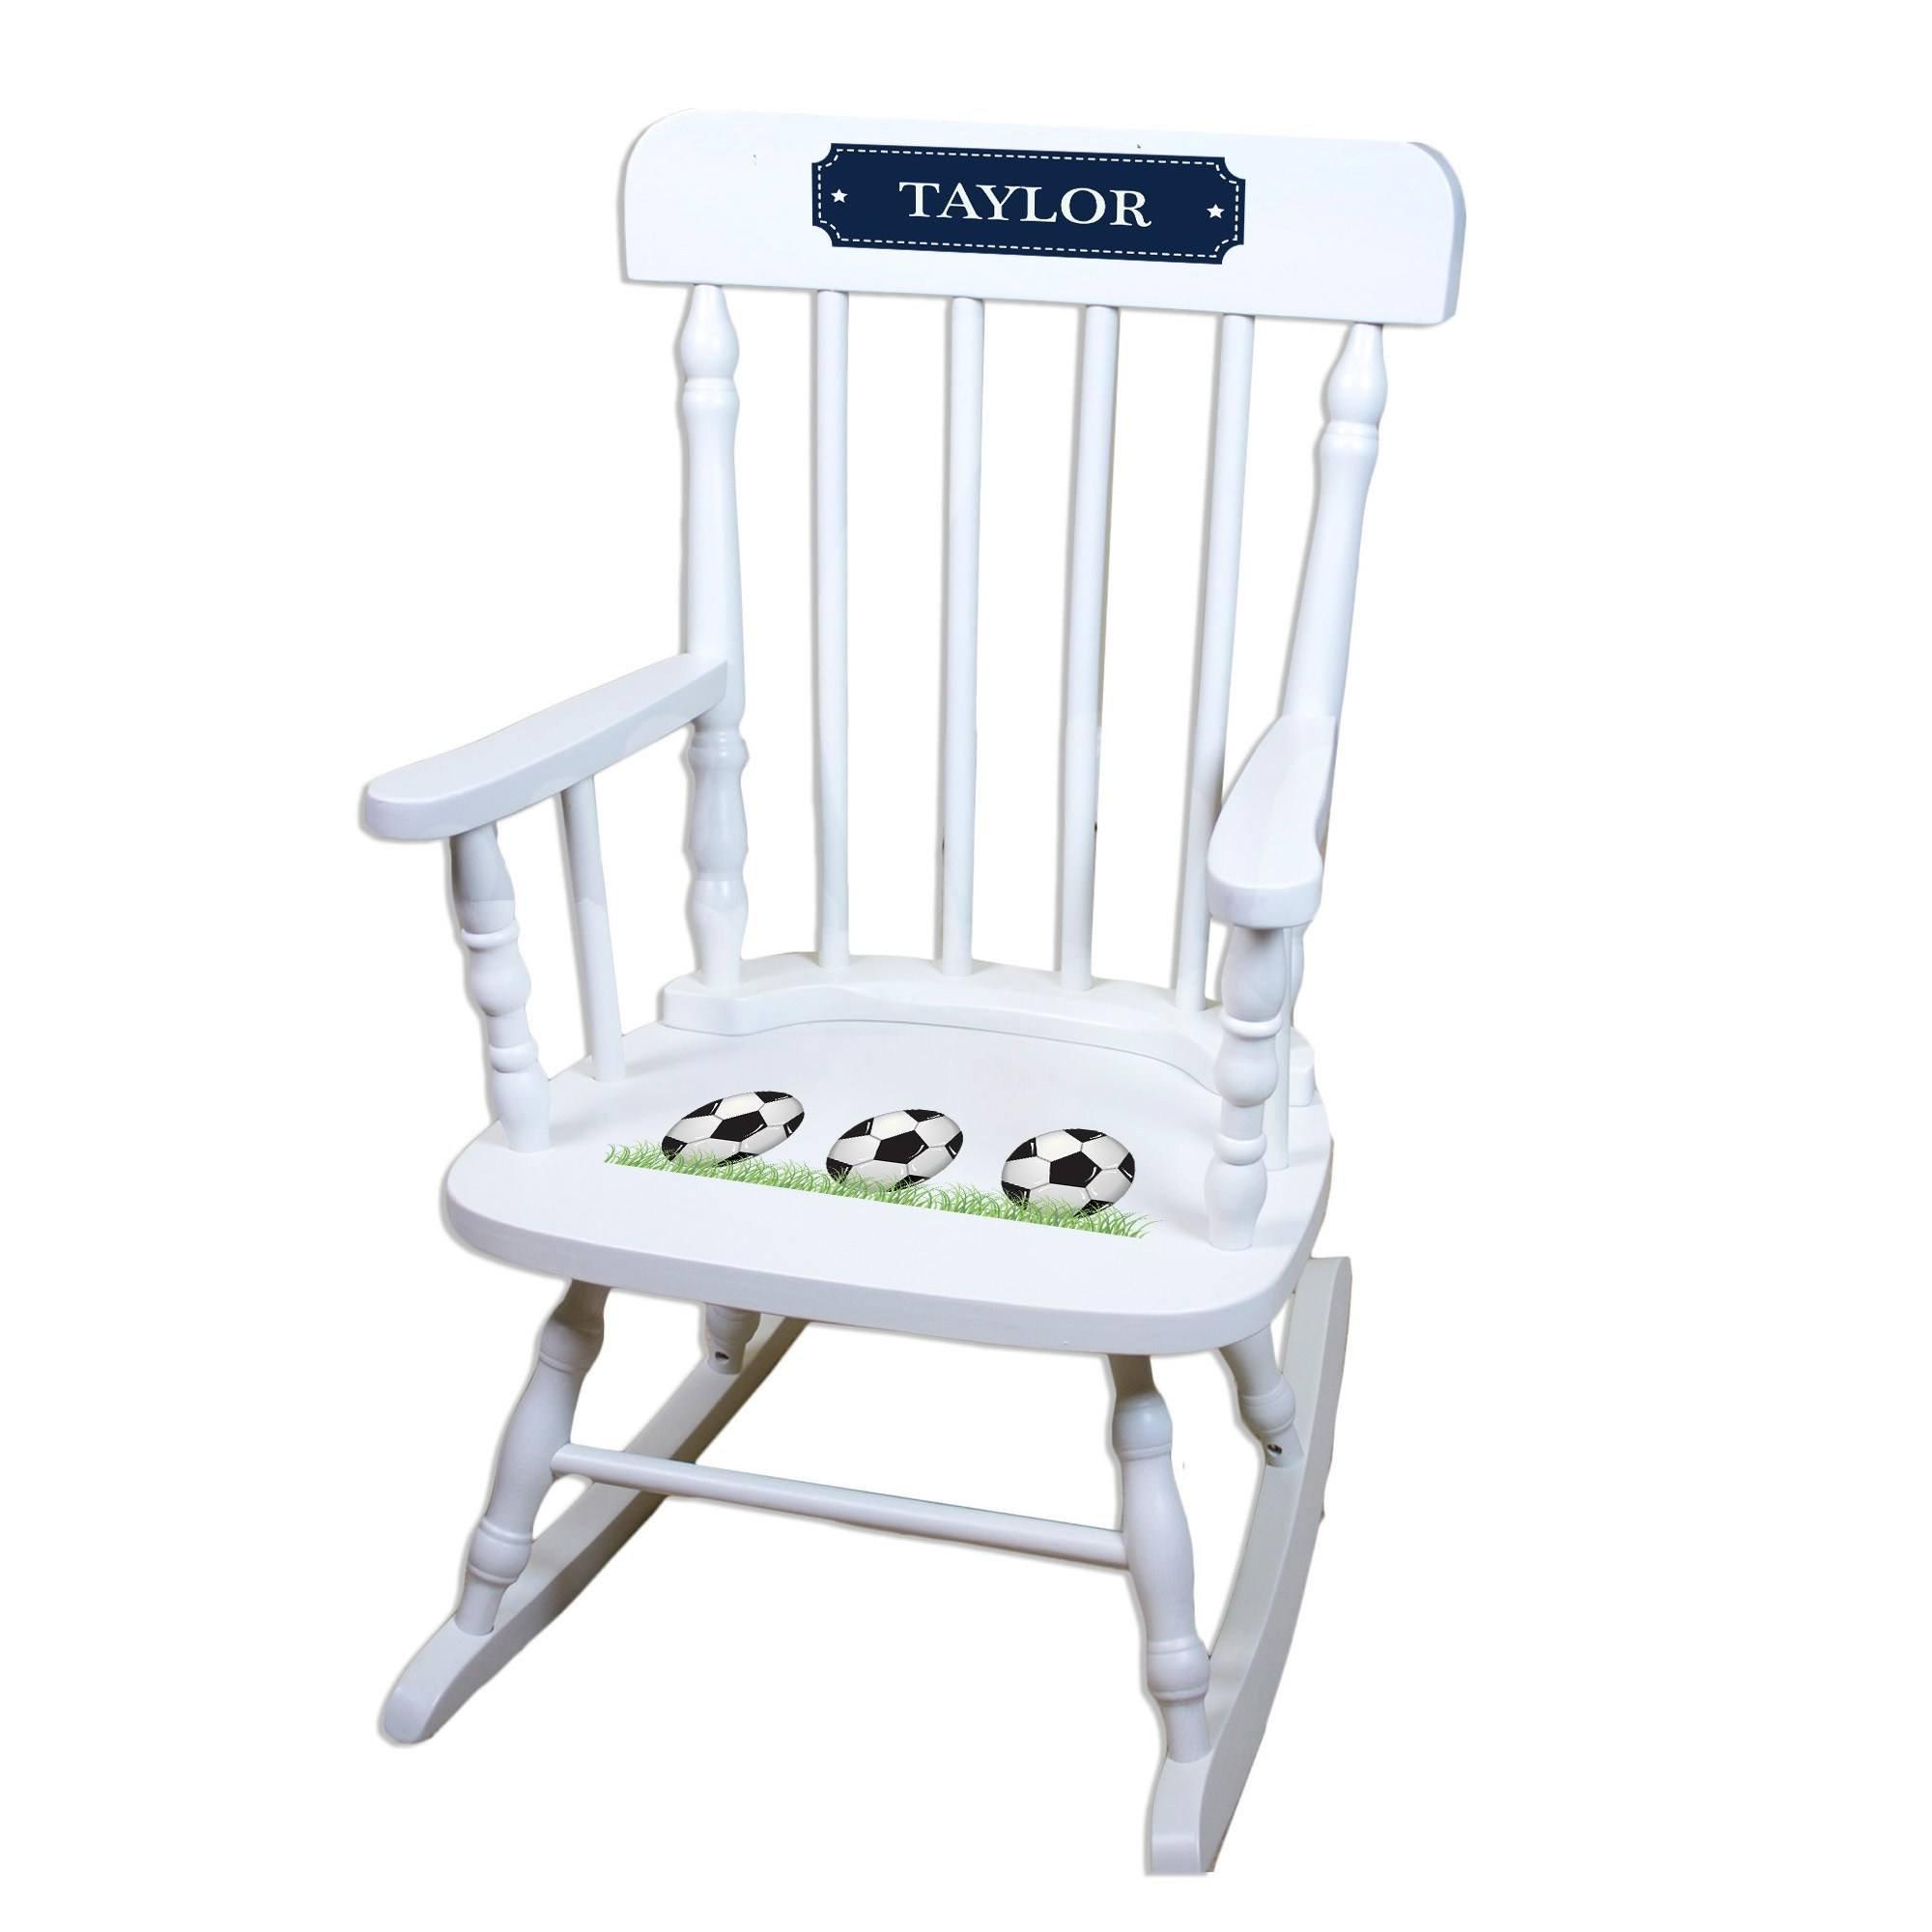 MyBambino Personalized Soccer Balls White Wooden Childrens Rocking Chair